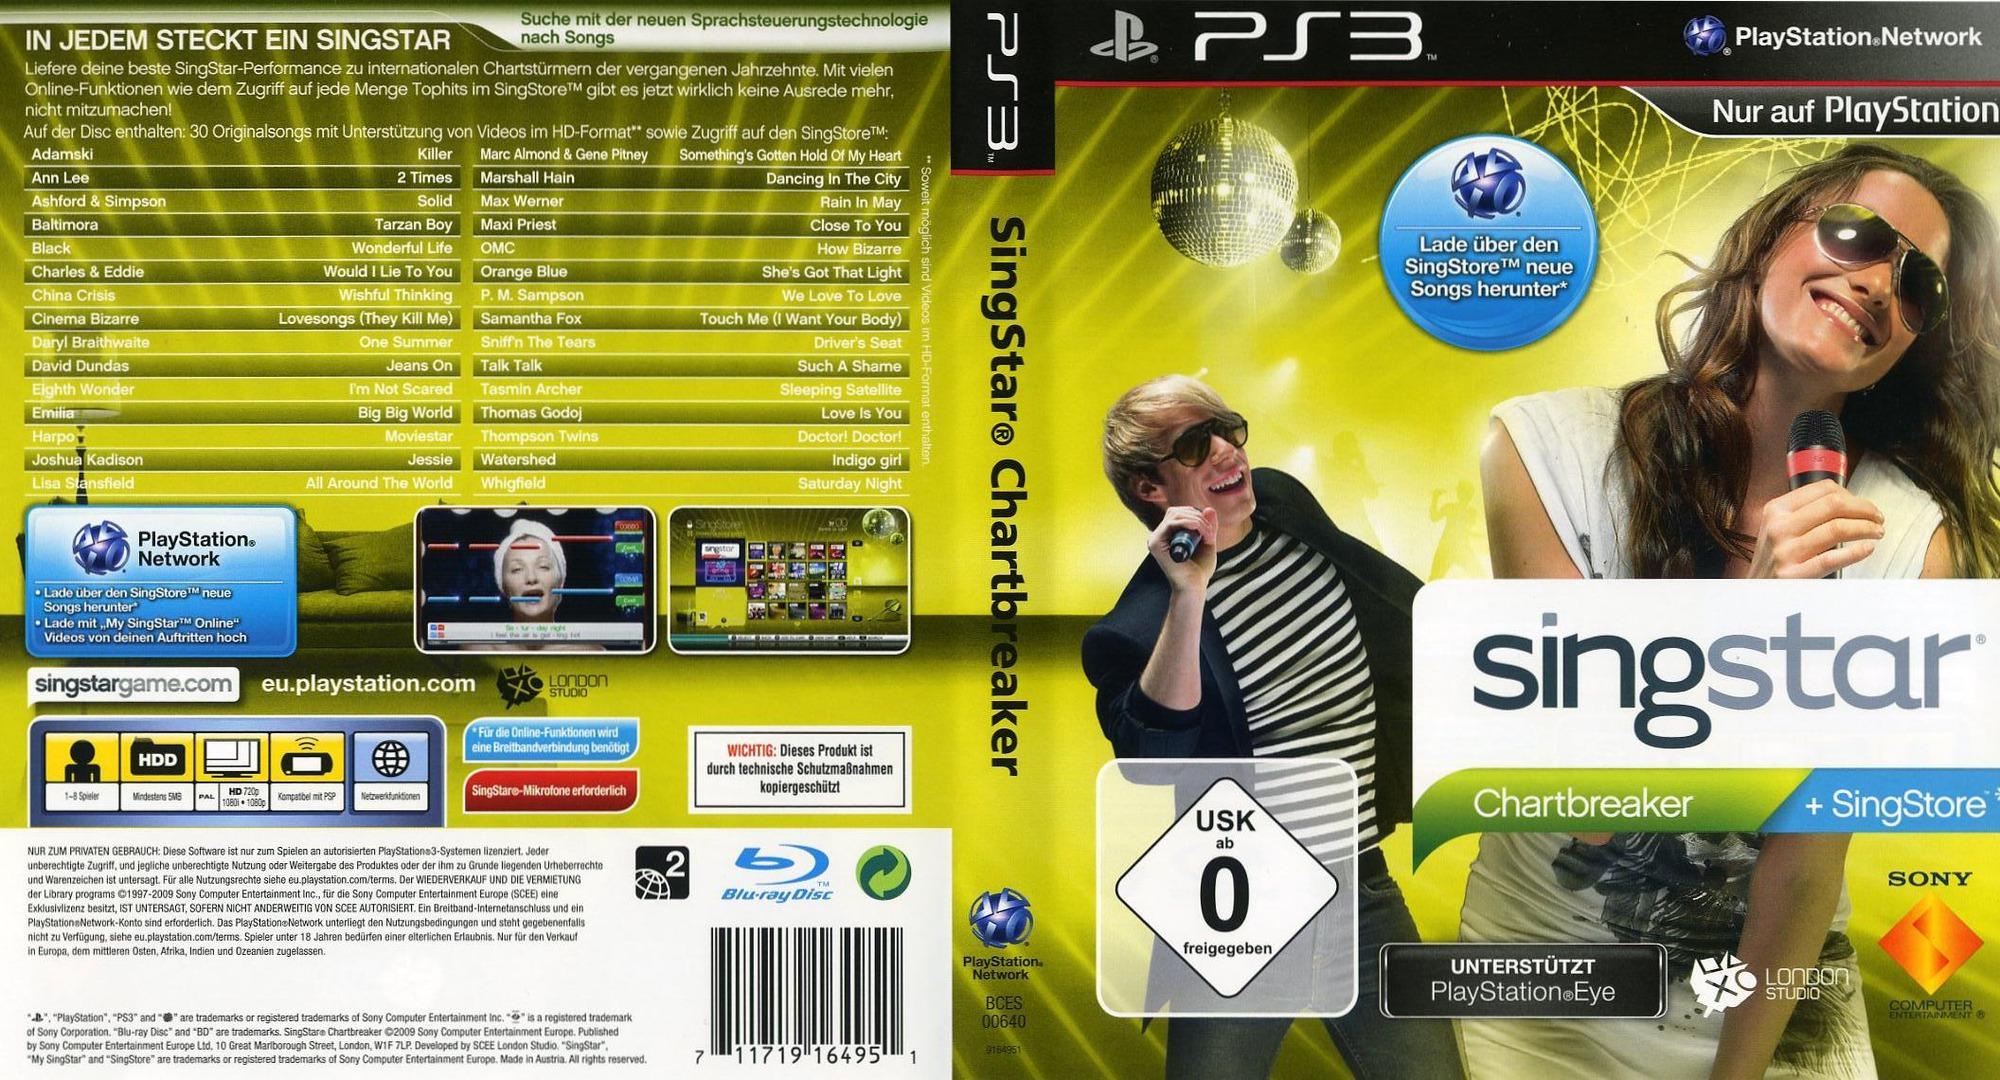 SingStar: Chartbreaker PS3 coverfullHQ (BCES00640)